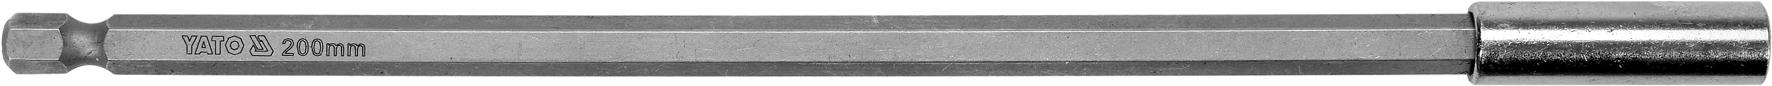 Fixator magnetic p/u bituri 1/4 200mm